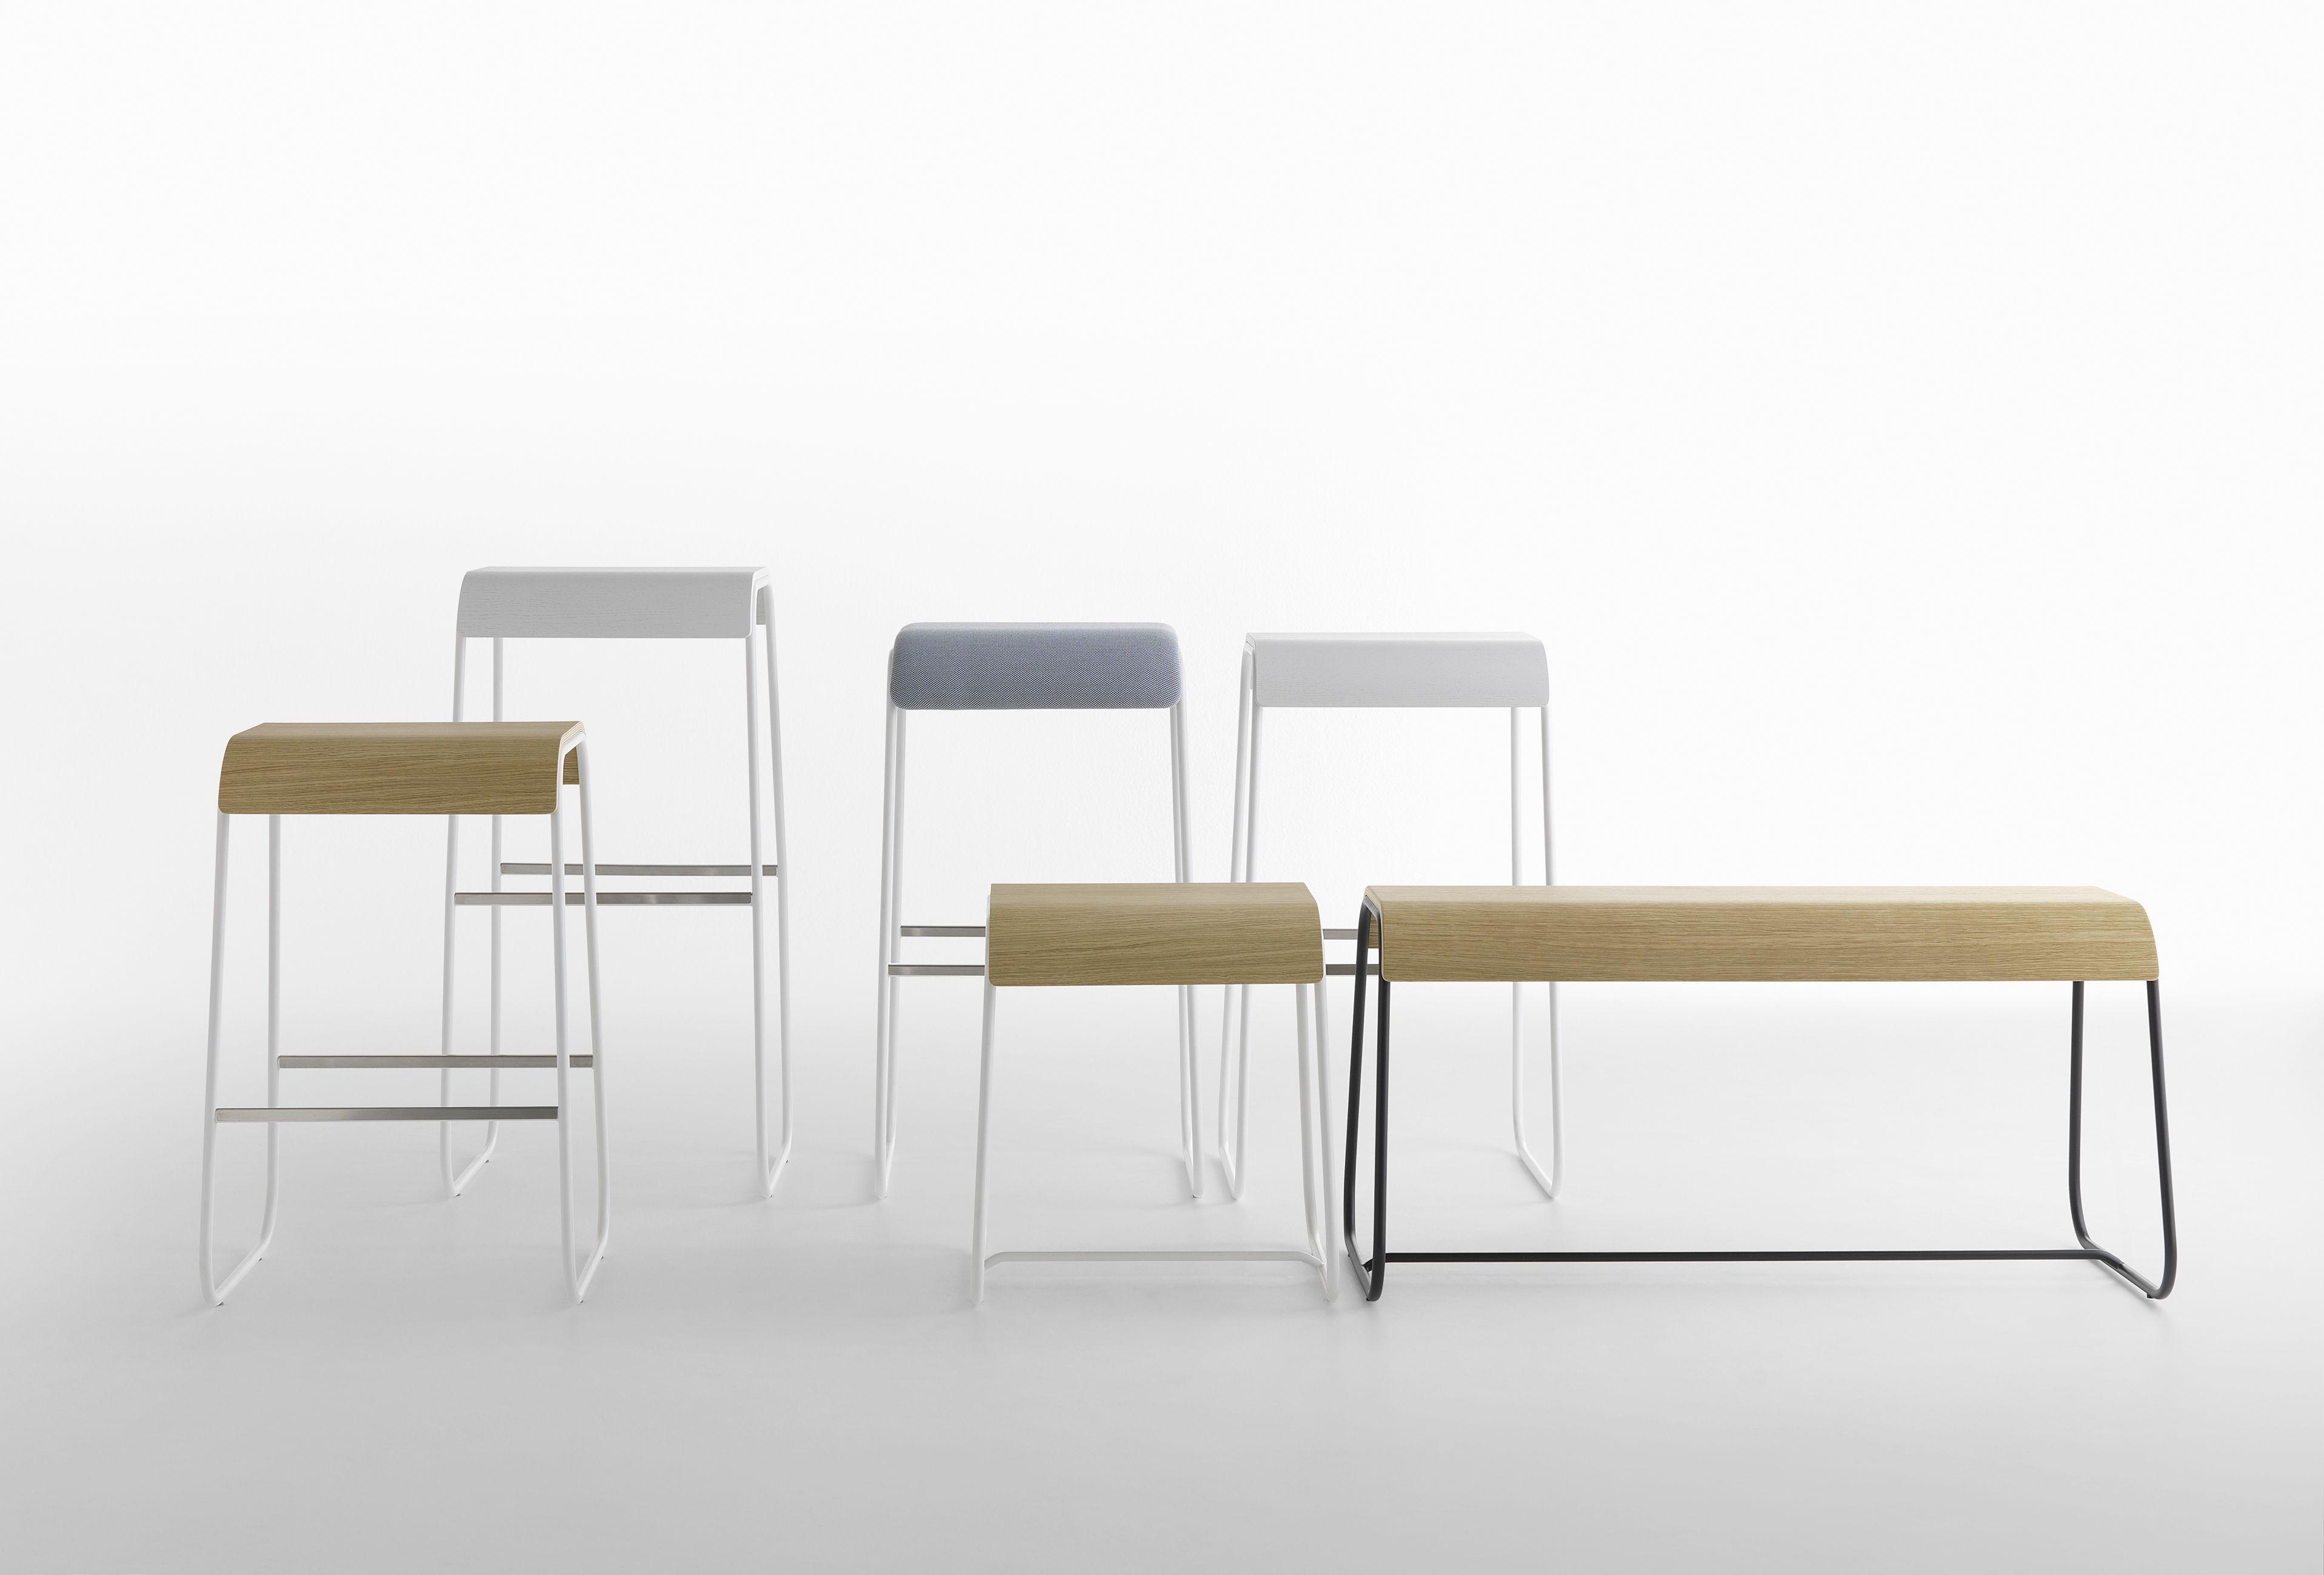 LINEO Panca by Crassevig design Guggenbichler design